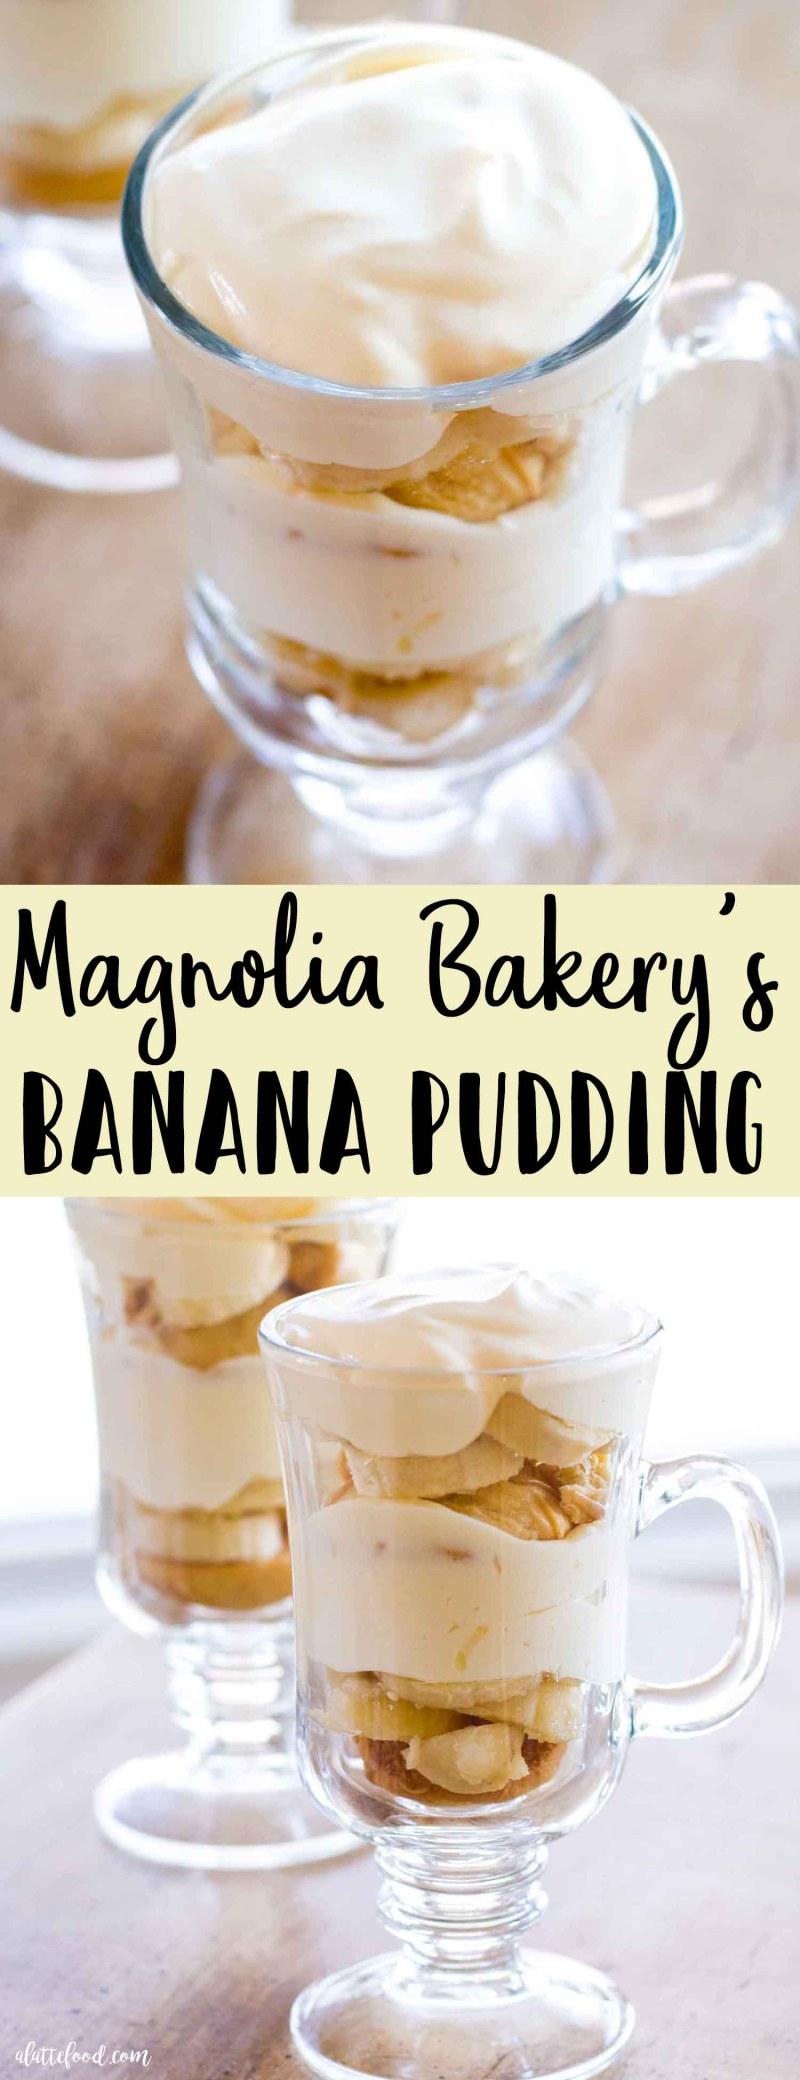 banana pudding recipe collage